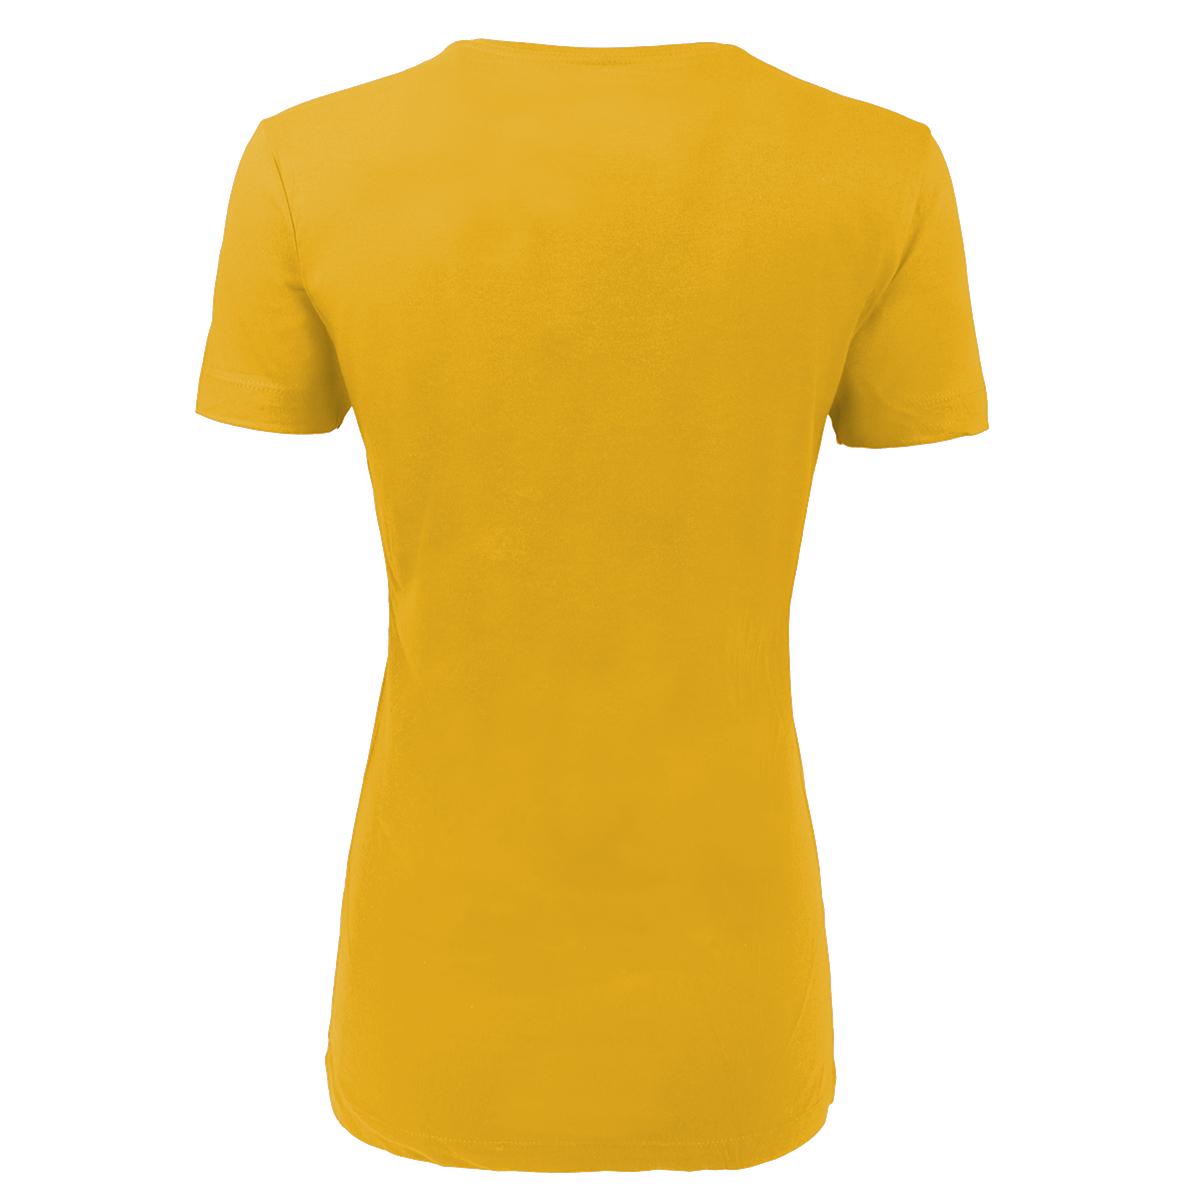 Nike-Women-039-s-Cotton-Slim-Fit-T-Shirt thumbnail 23